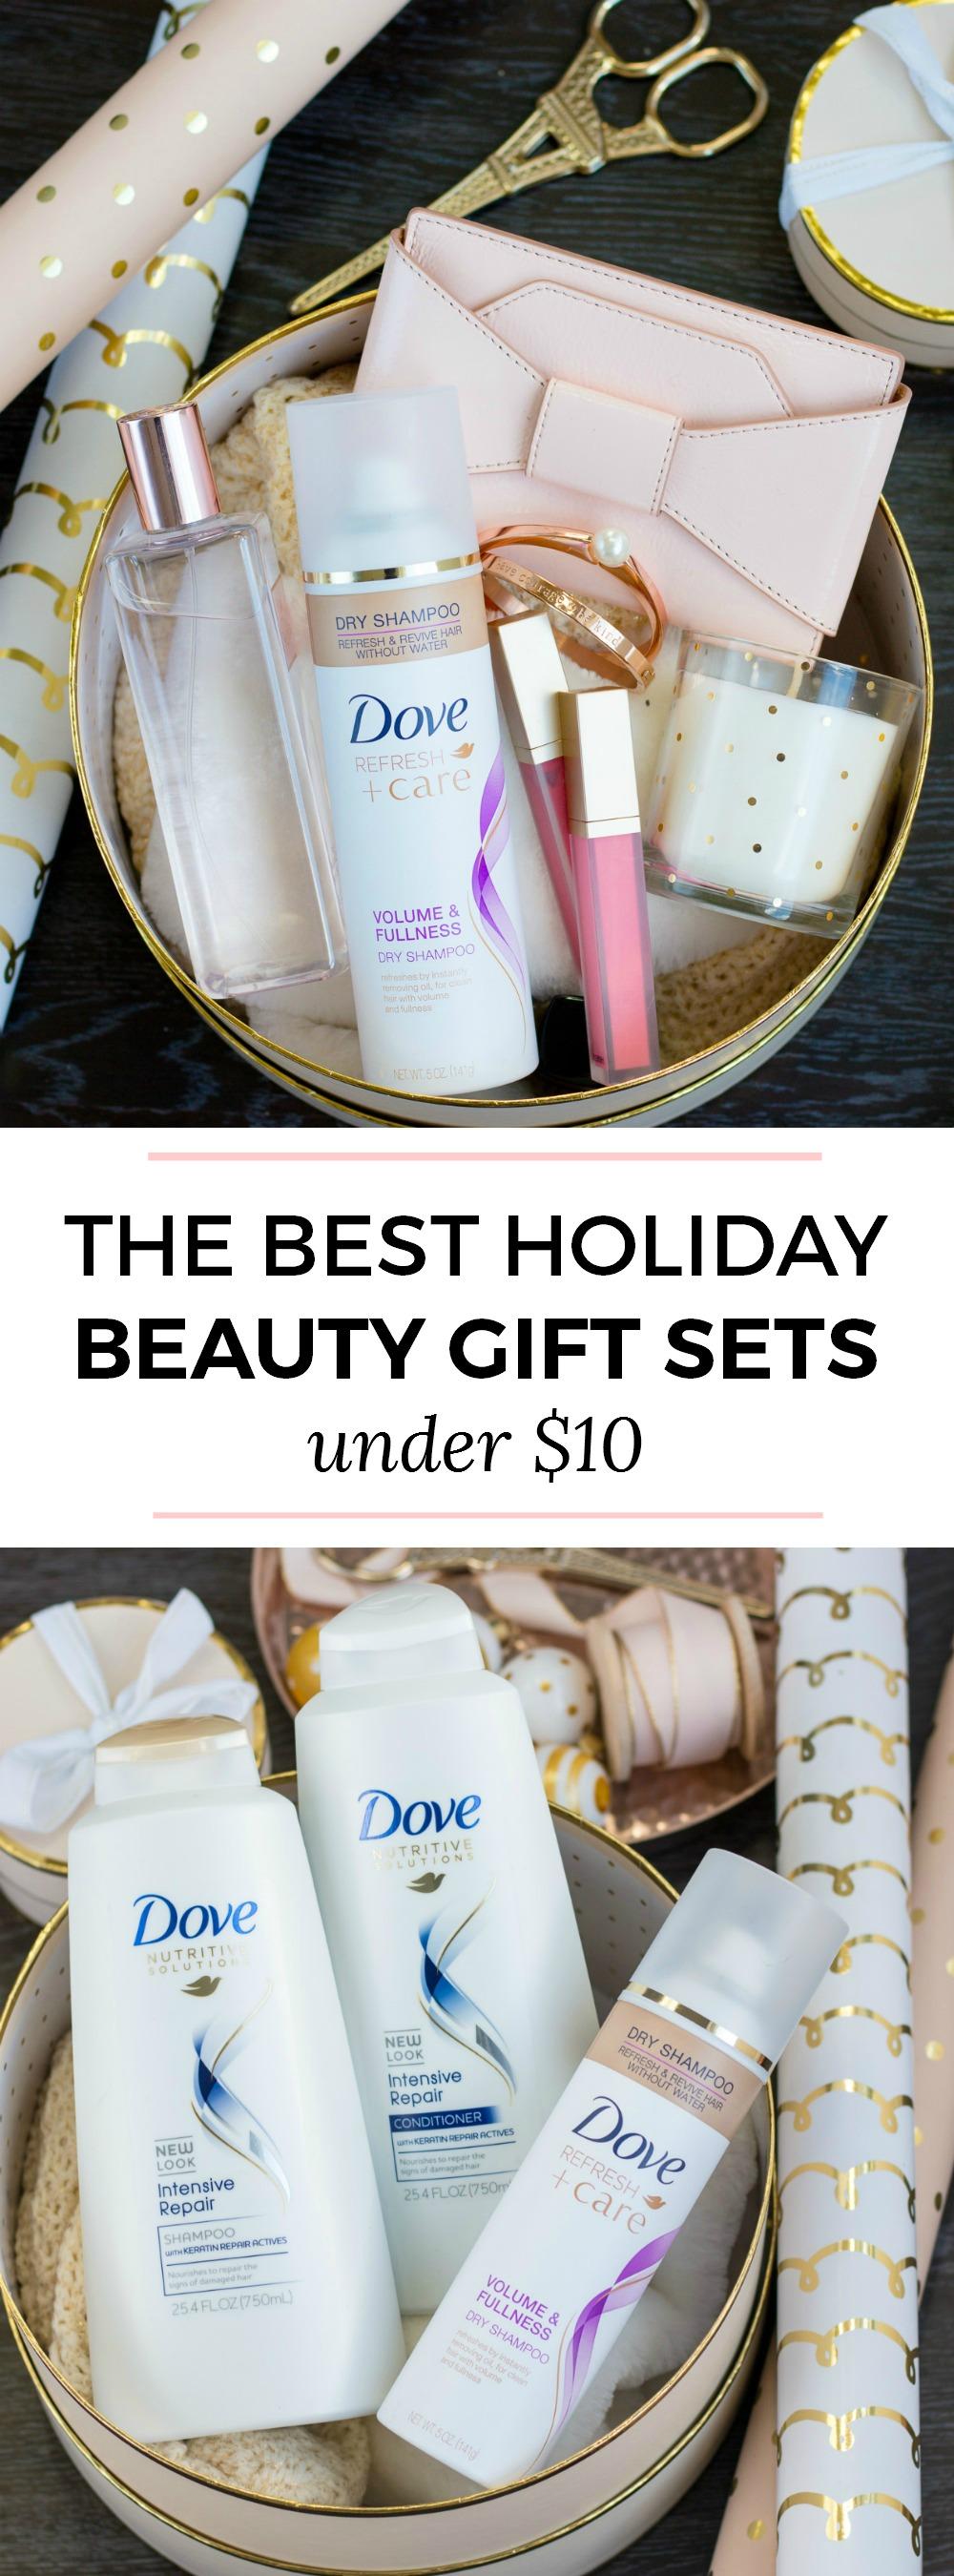 Holiday Beauty Gift Sets under $15 | Ashley brooke, Christmas gifts ...